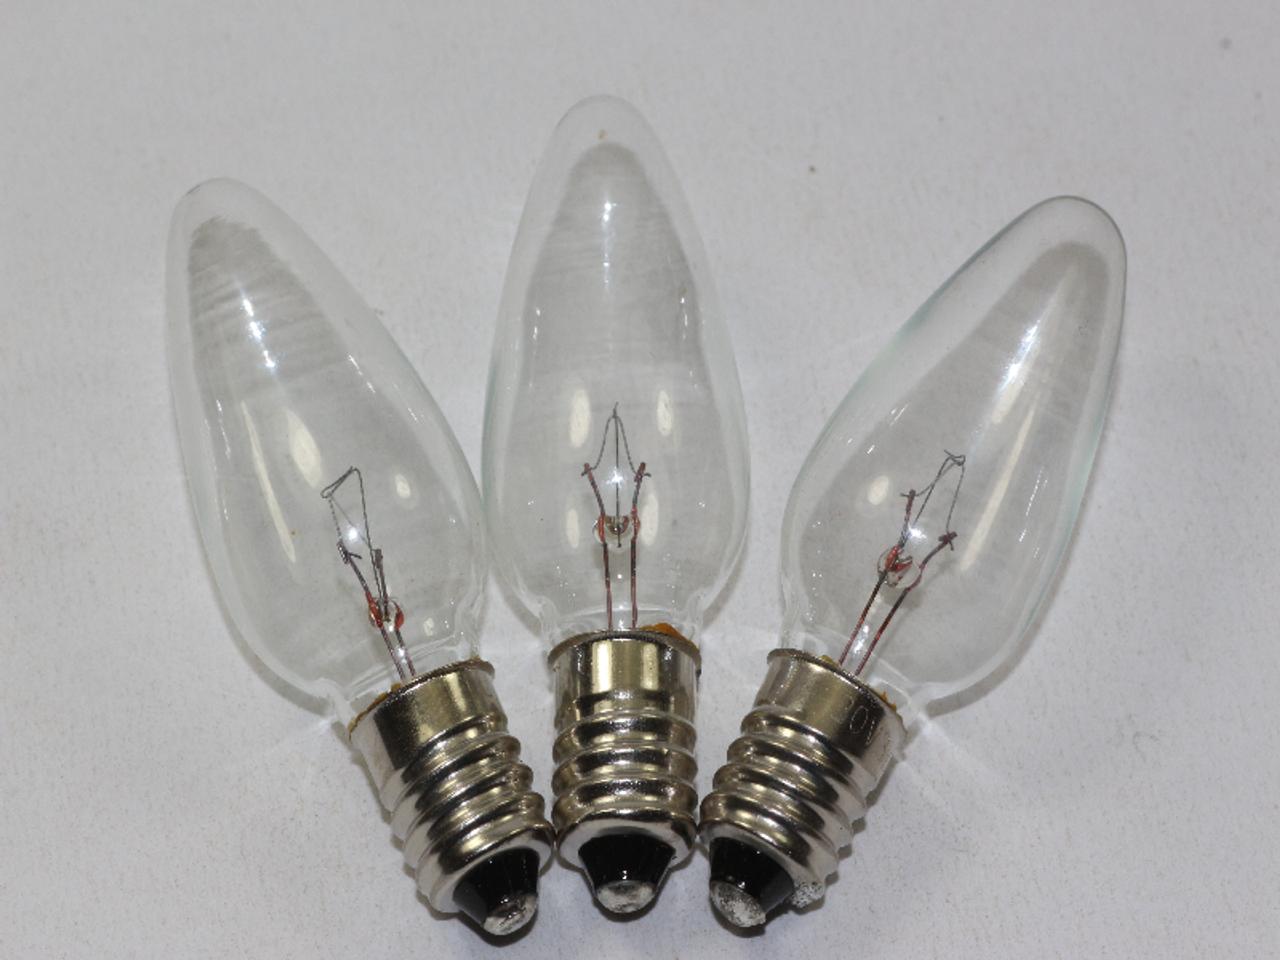 Clear Christmas Lights.3 X 20v 3w 0 15a E10 Clear Christmas Lights Spare Bulbs Pifco Dencon 784wc